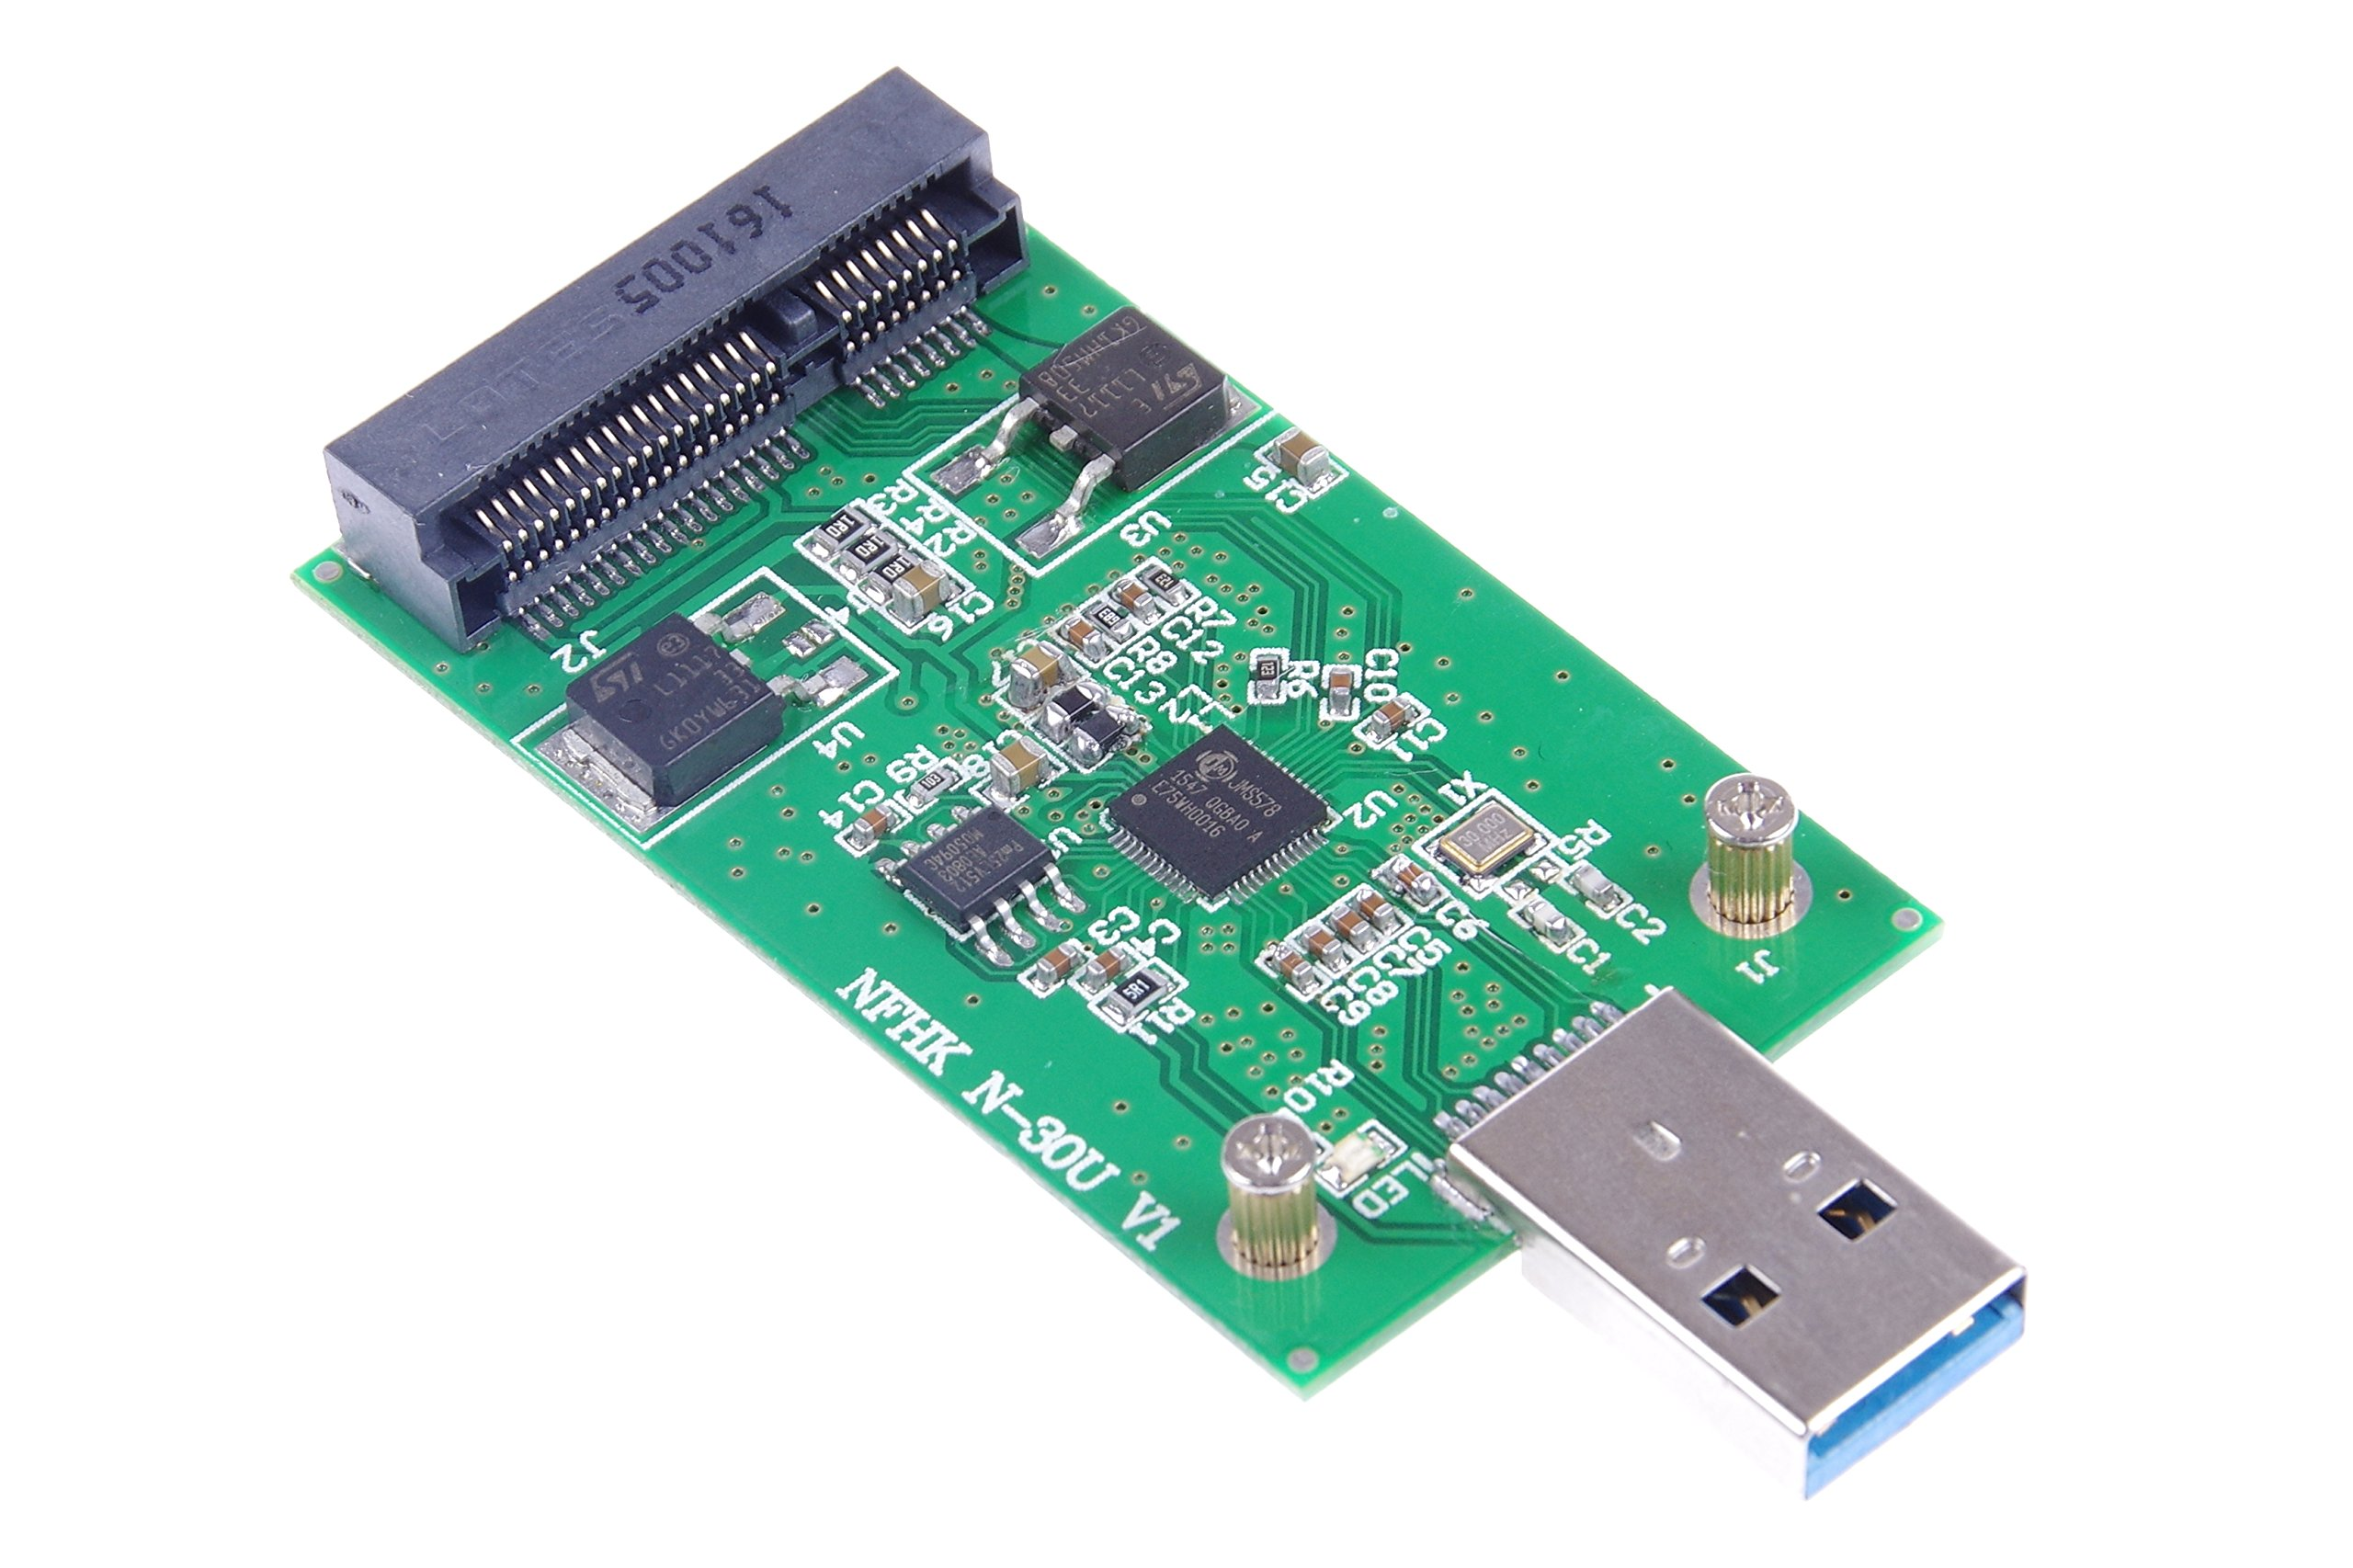 KNACRO USB 3.0 mSATA SSD Adapter as USB Disk Driver don't need USB cable USB 3.0 to mSATA SSD adapter card by KNACRO (Image #8)